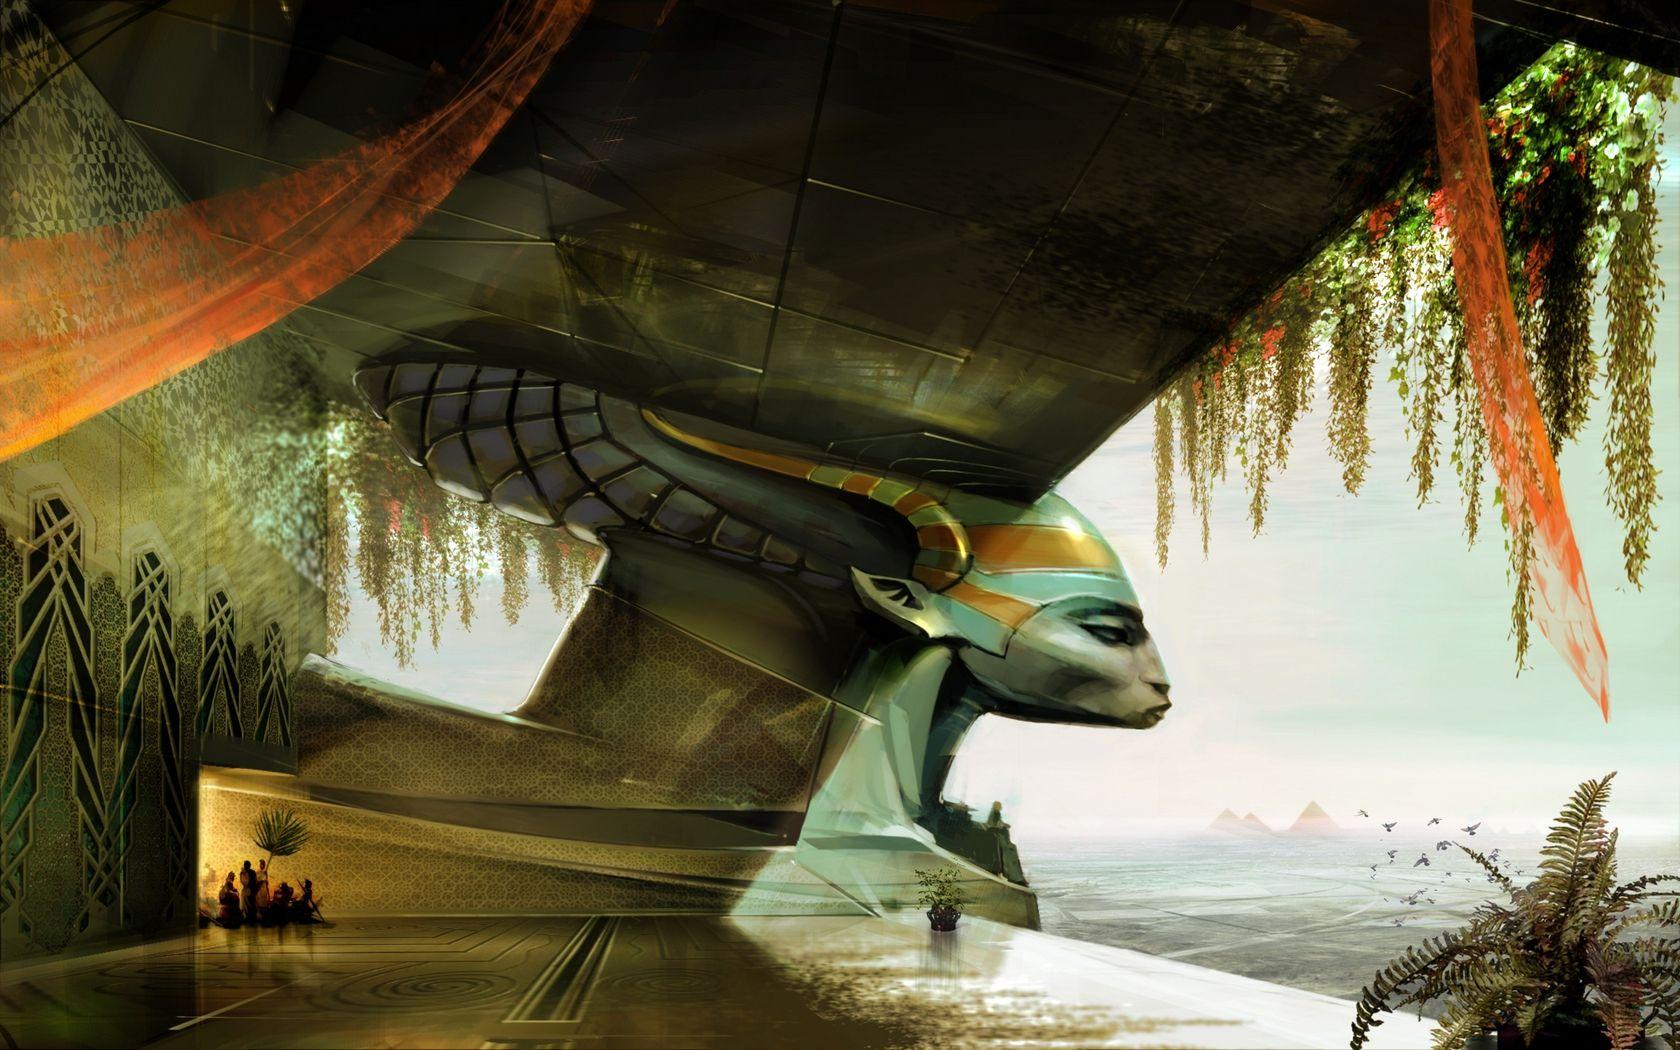 Egypt Warrior Illustration Anubis Pyramid Fantasy Art: Egypt, Egypt, Fantasy, Pyramids, Sci-Fi